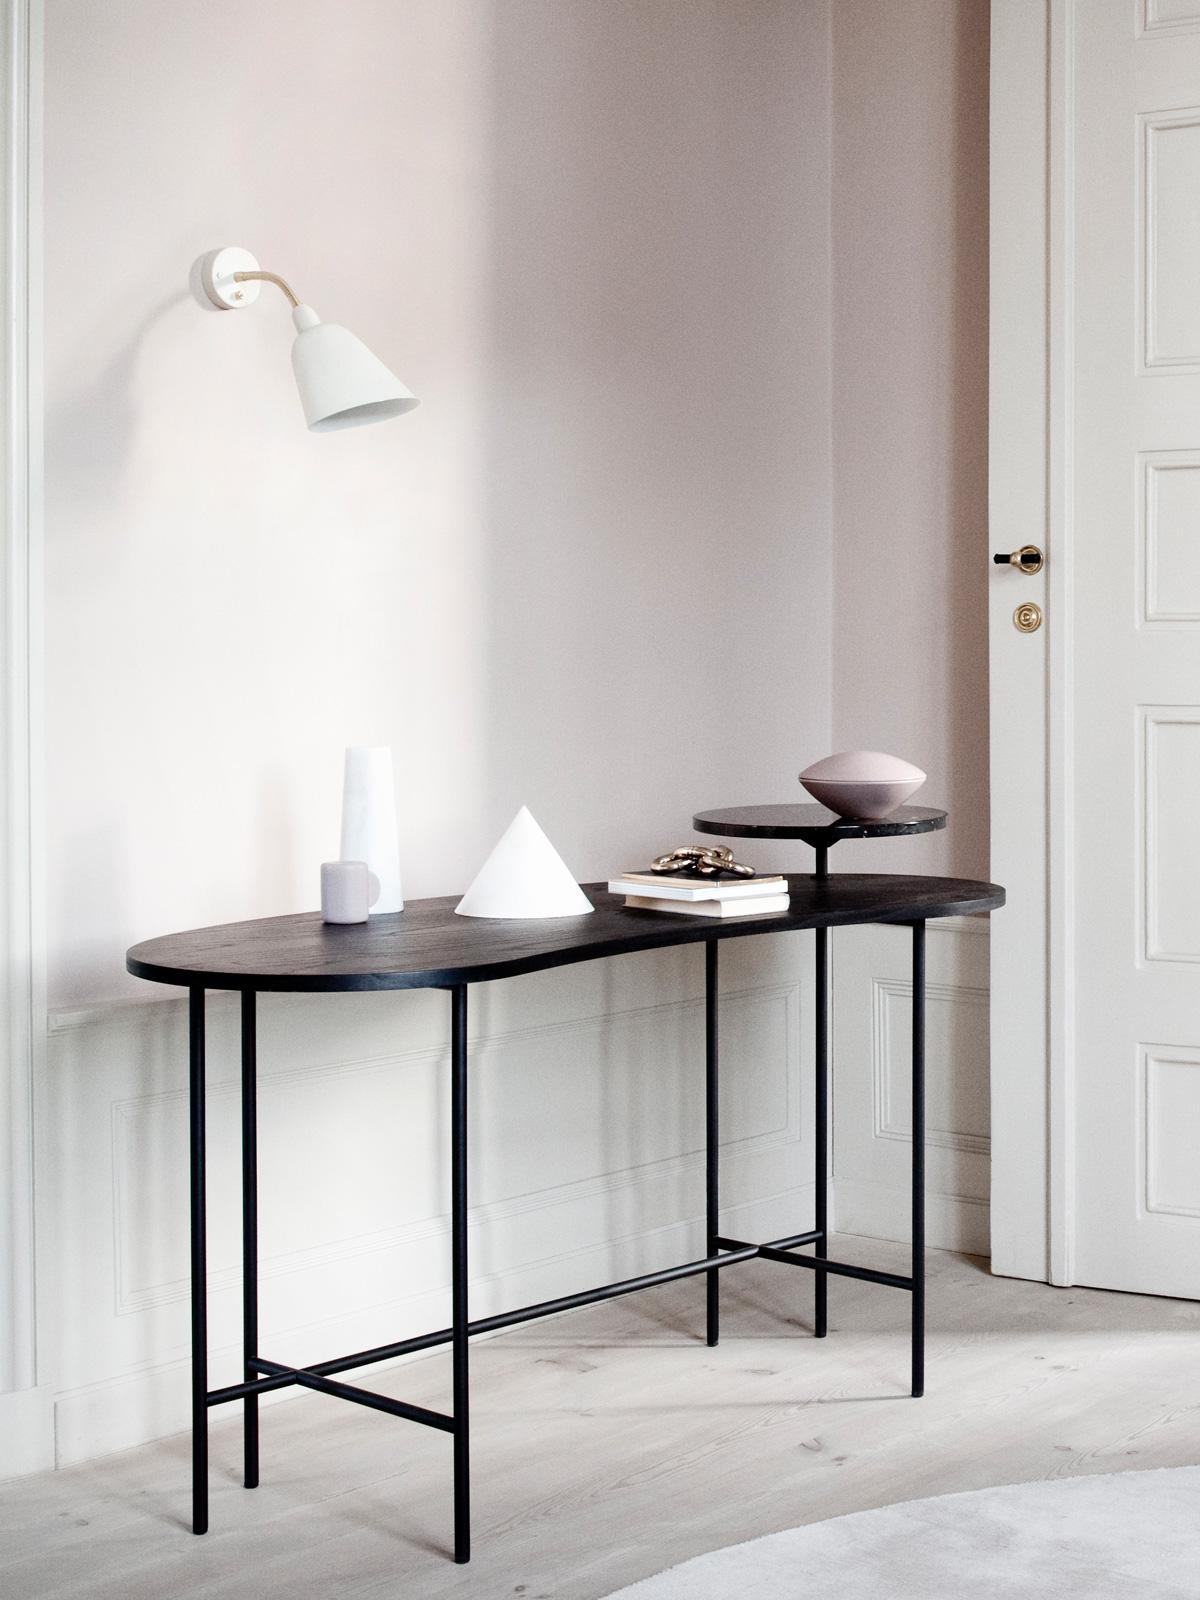 Wandleuchte AJ9 Bellevue Arne Jacobsen &tradition